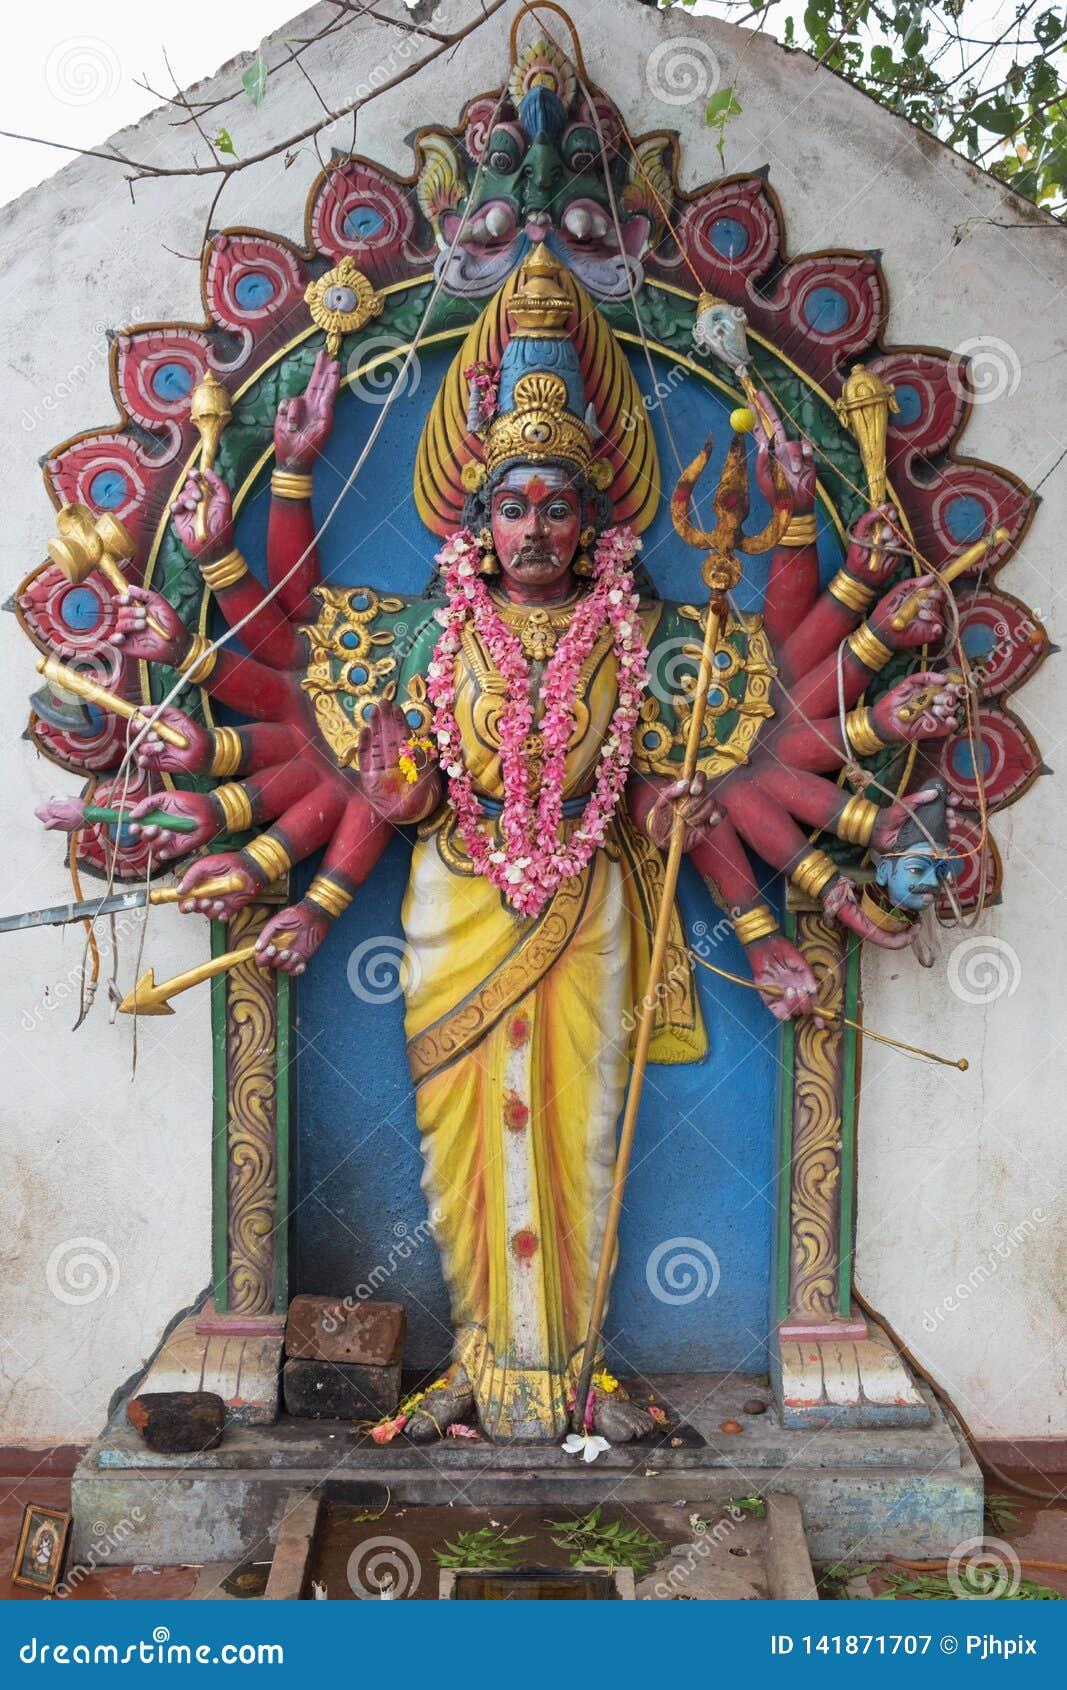 Sculpture Of The Hindu Goddess Durga In Tamil Nadu Stock